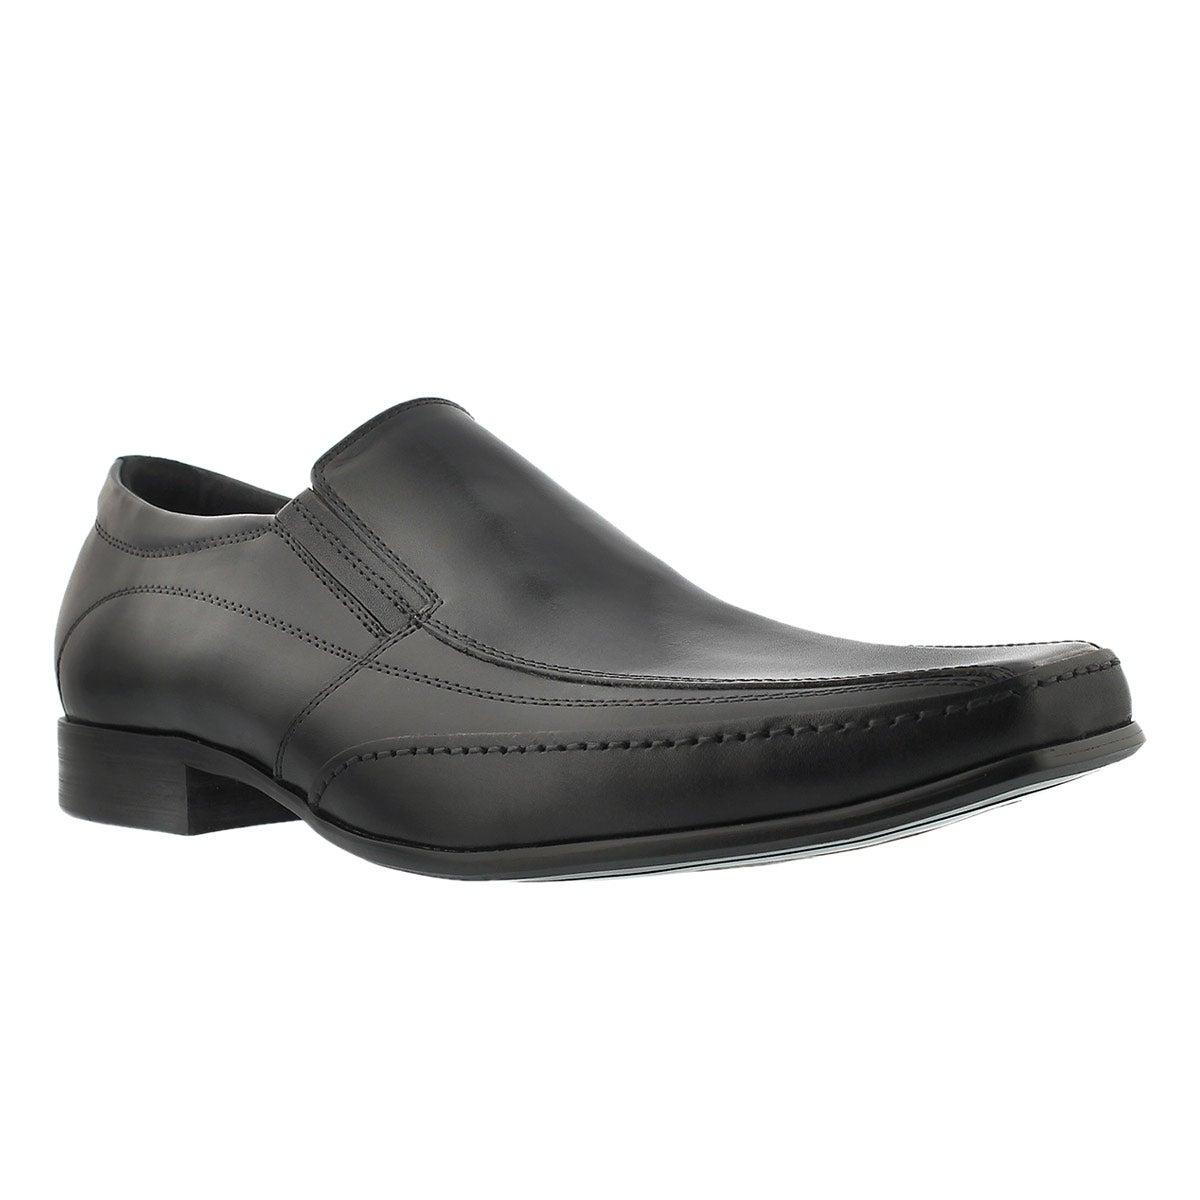 softmoc s justin 2 black slip on dress shoes